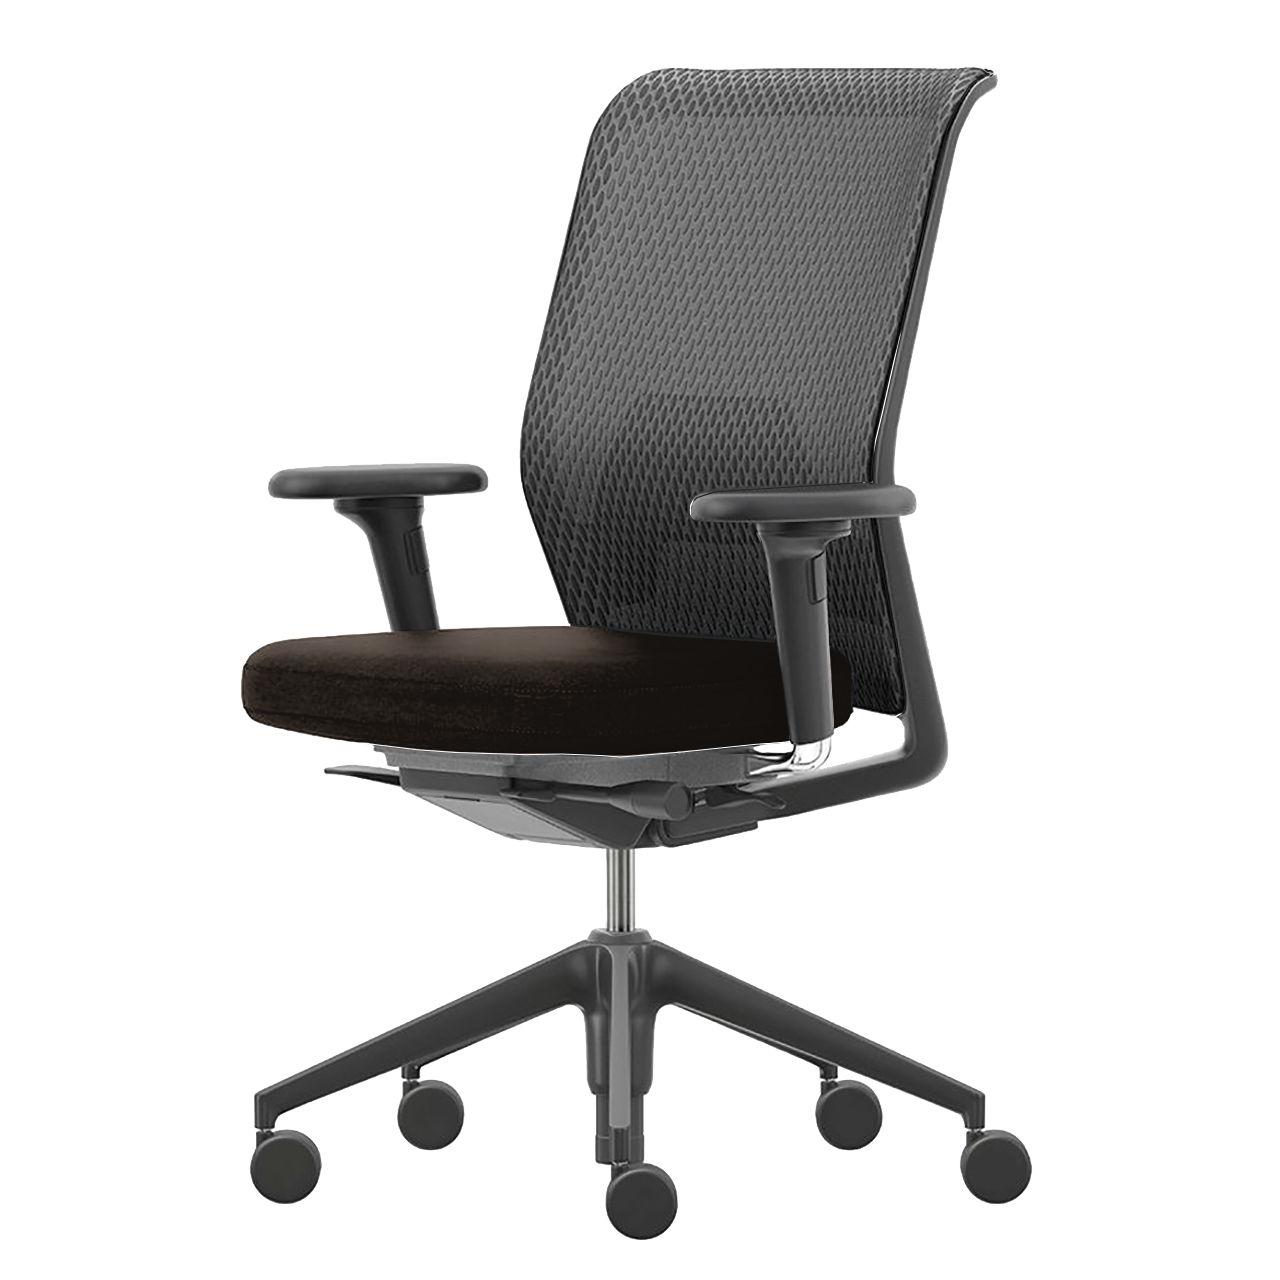 ID Mesh Office Chair in Basic Dark Plastic by Vitra